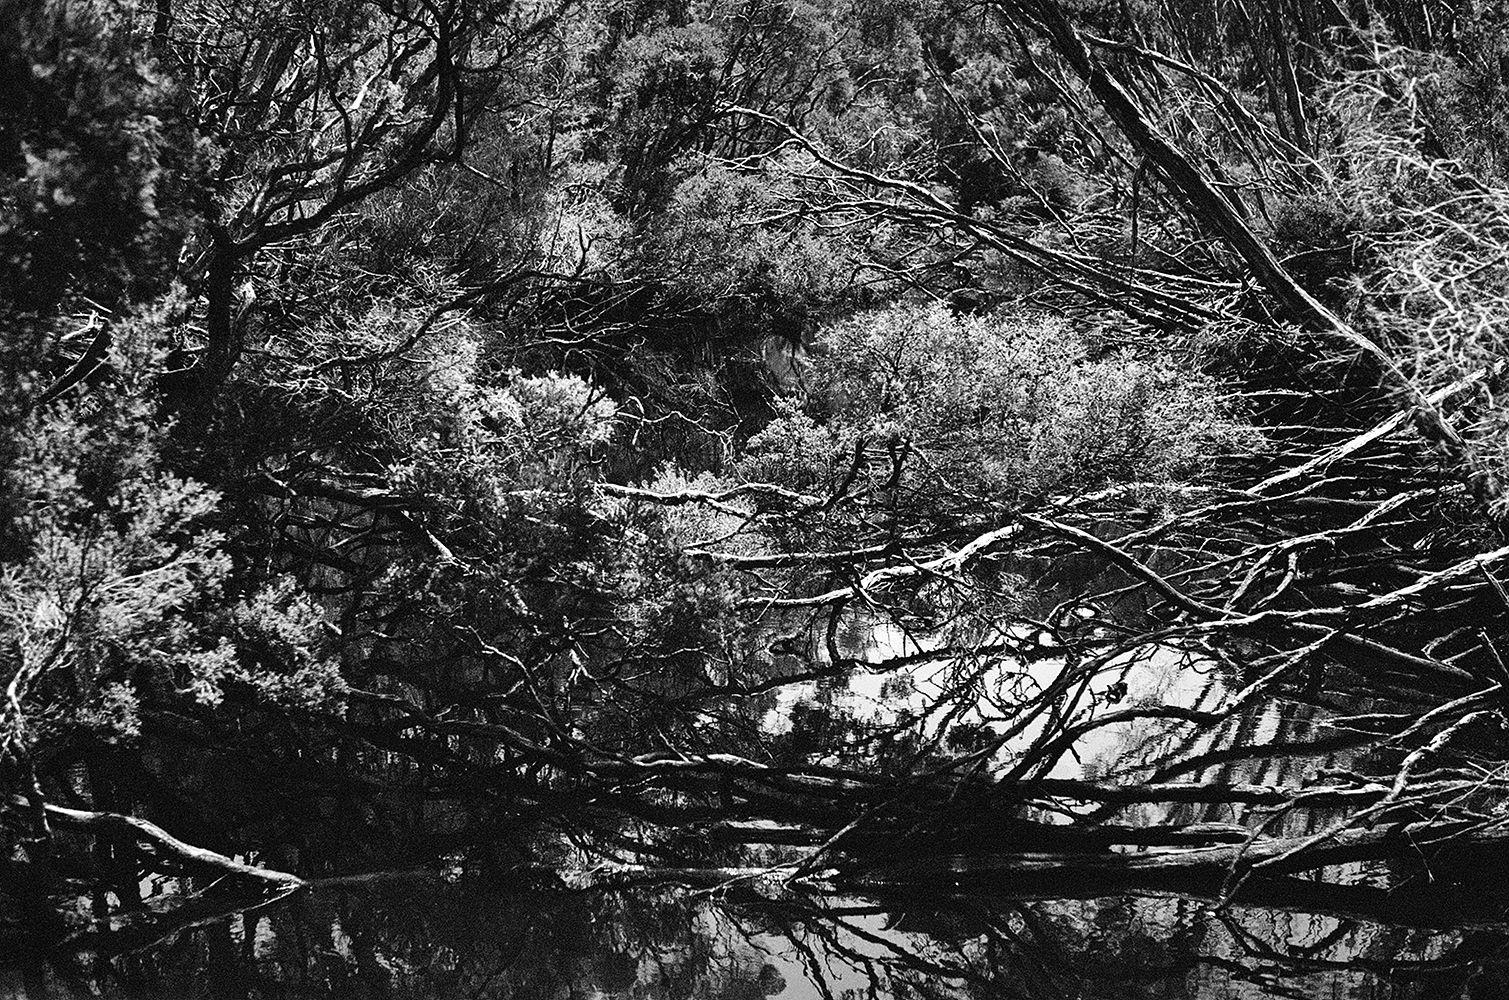 black and white photo of Wilson's prom bushland